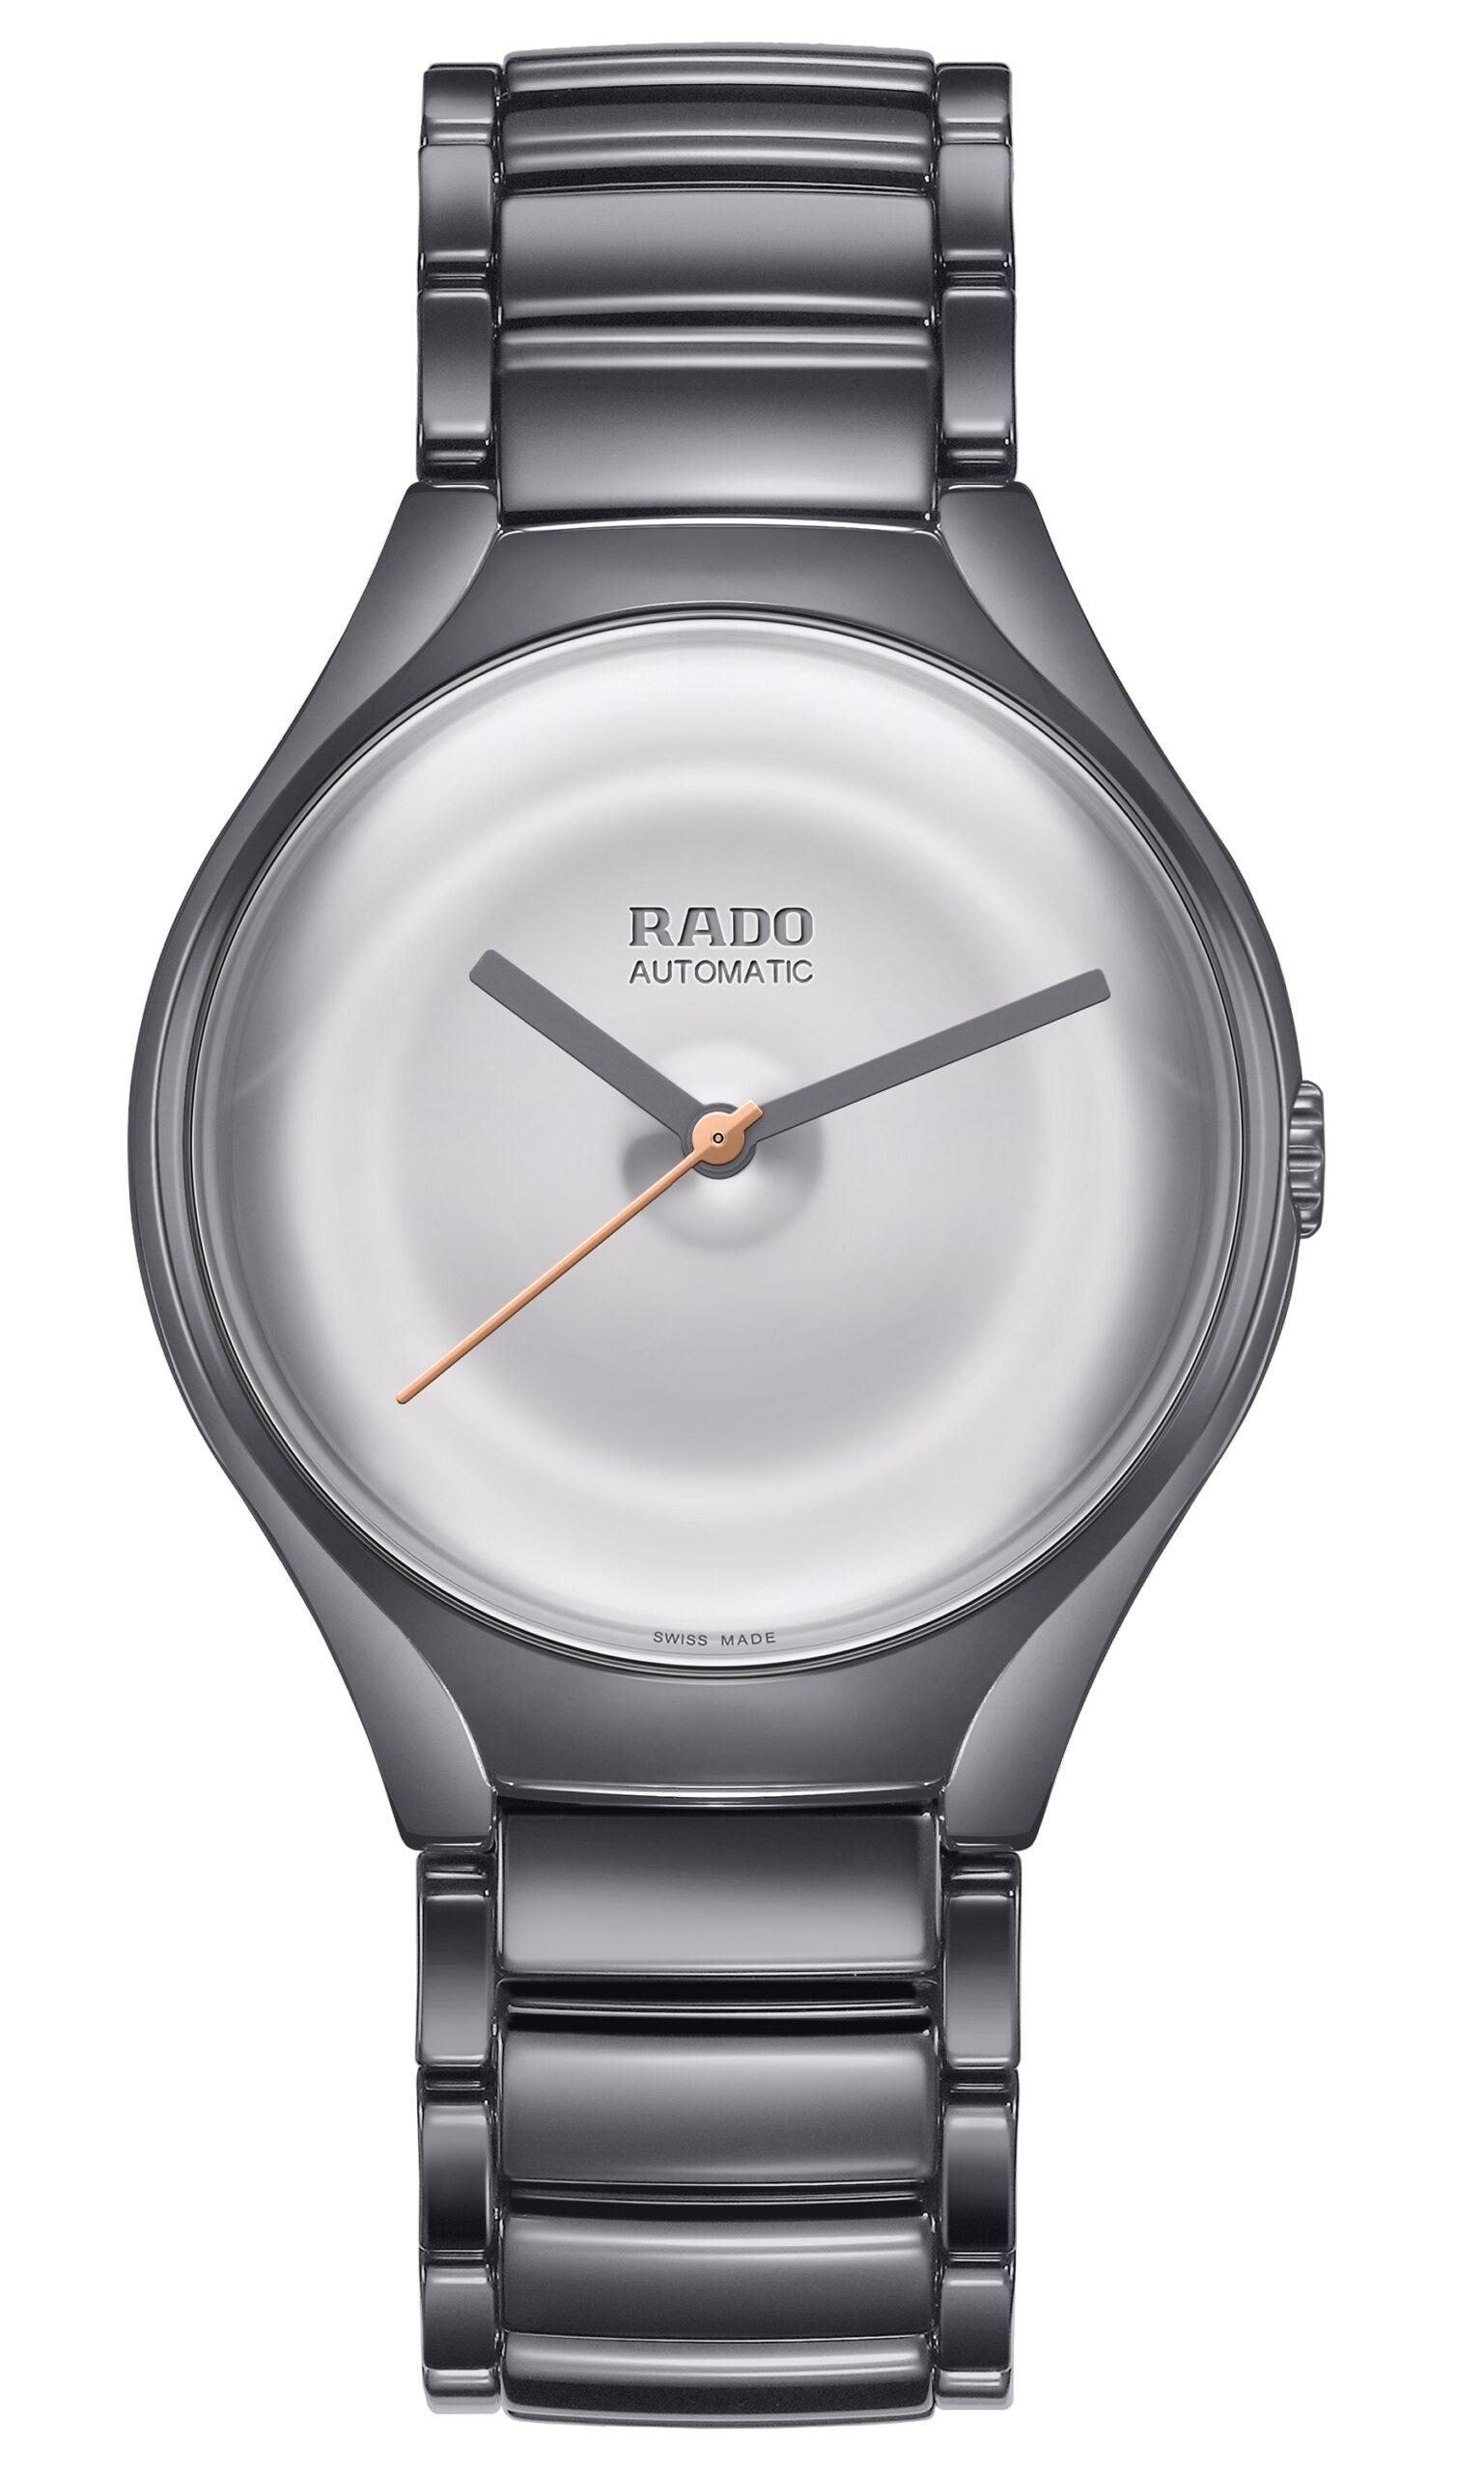 Rado True Face designed by Oskar Zieta